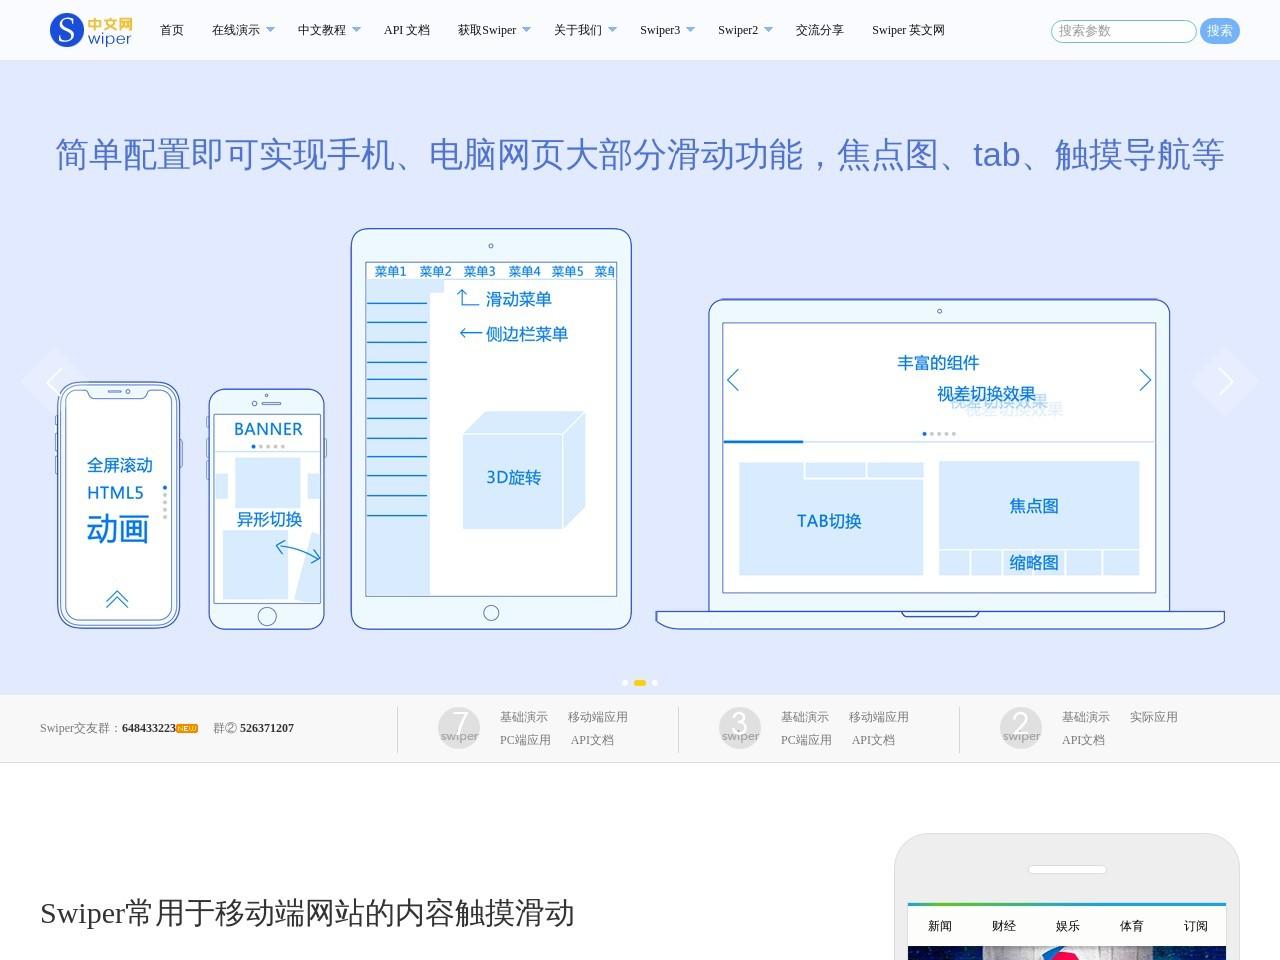 Swiper中文网_H5页面前端开发